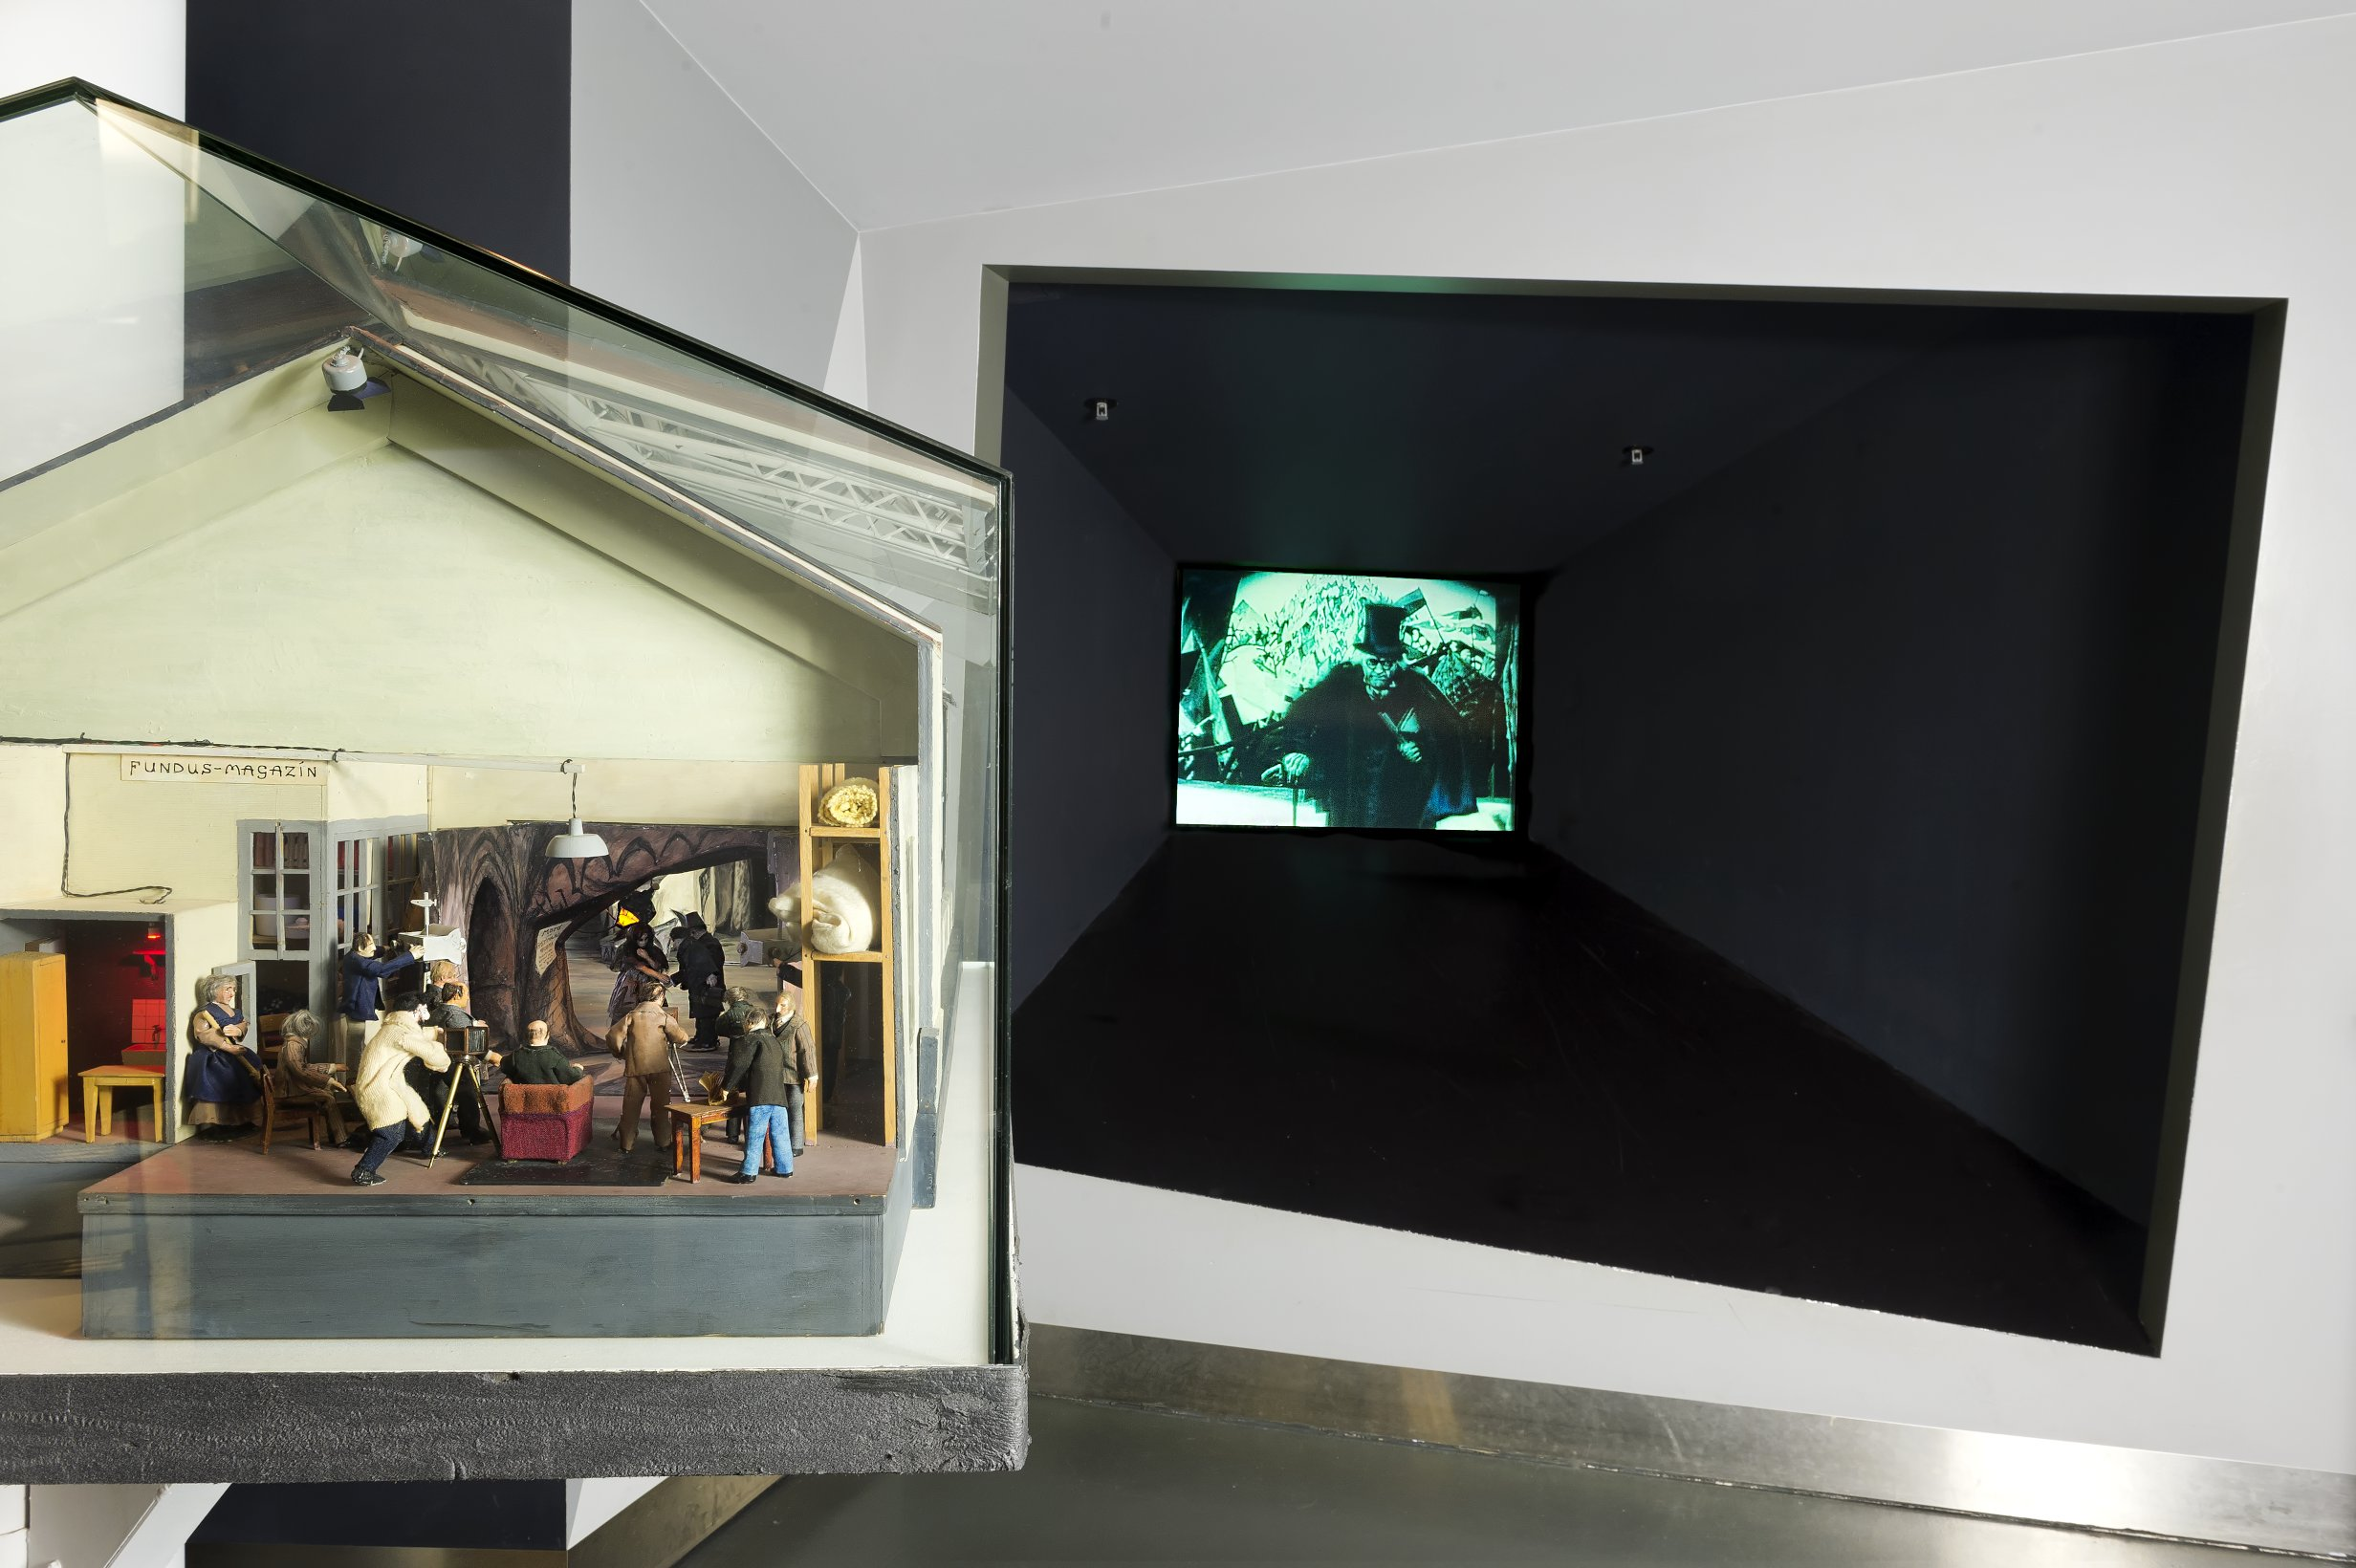 Studiomodell des Sets von Das Cabinet des Dr. Caligari